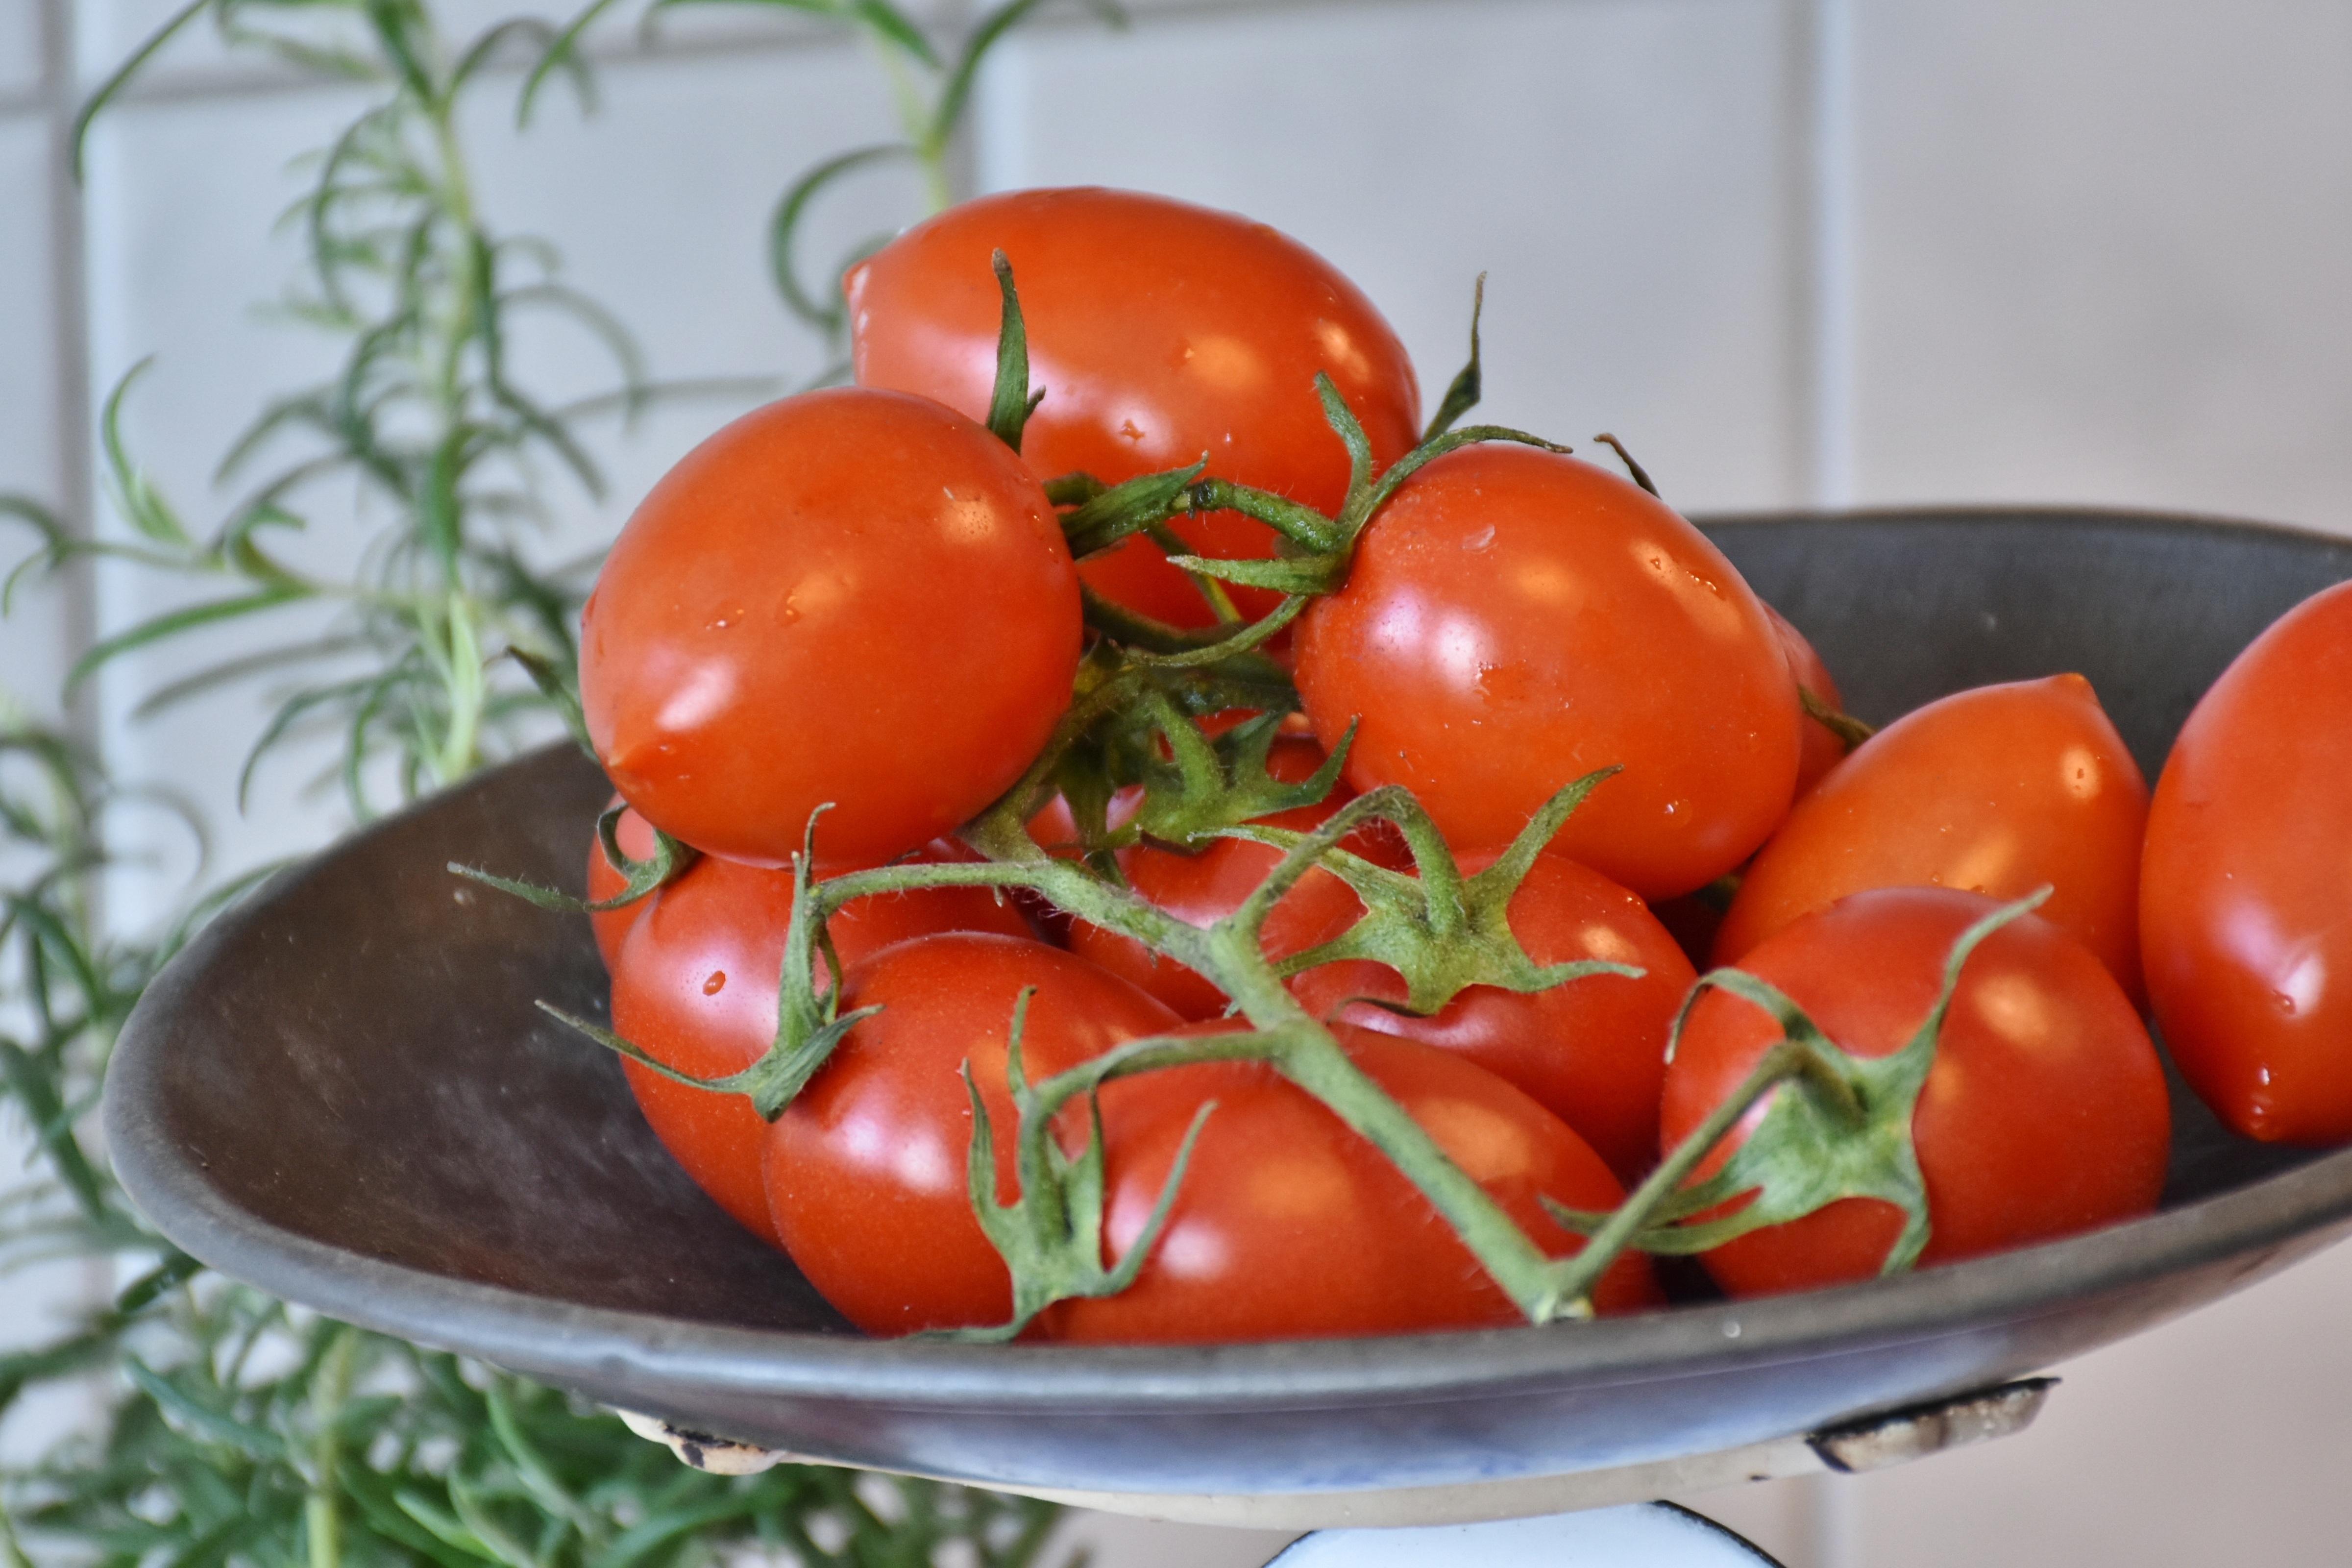 Gambar Menanam Buah Makan Hidangan Makanan Salad Merah Menghasilkan Sayur Mayur Dapur Menimbang Sehat Kalori Sayuran Lezat Vegetarian